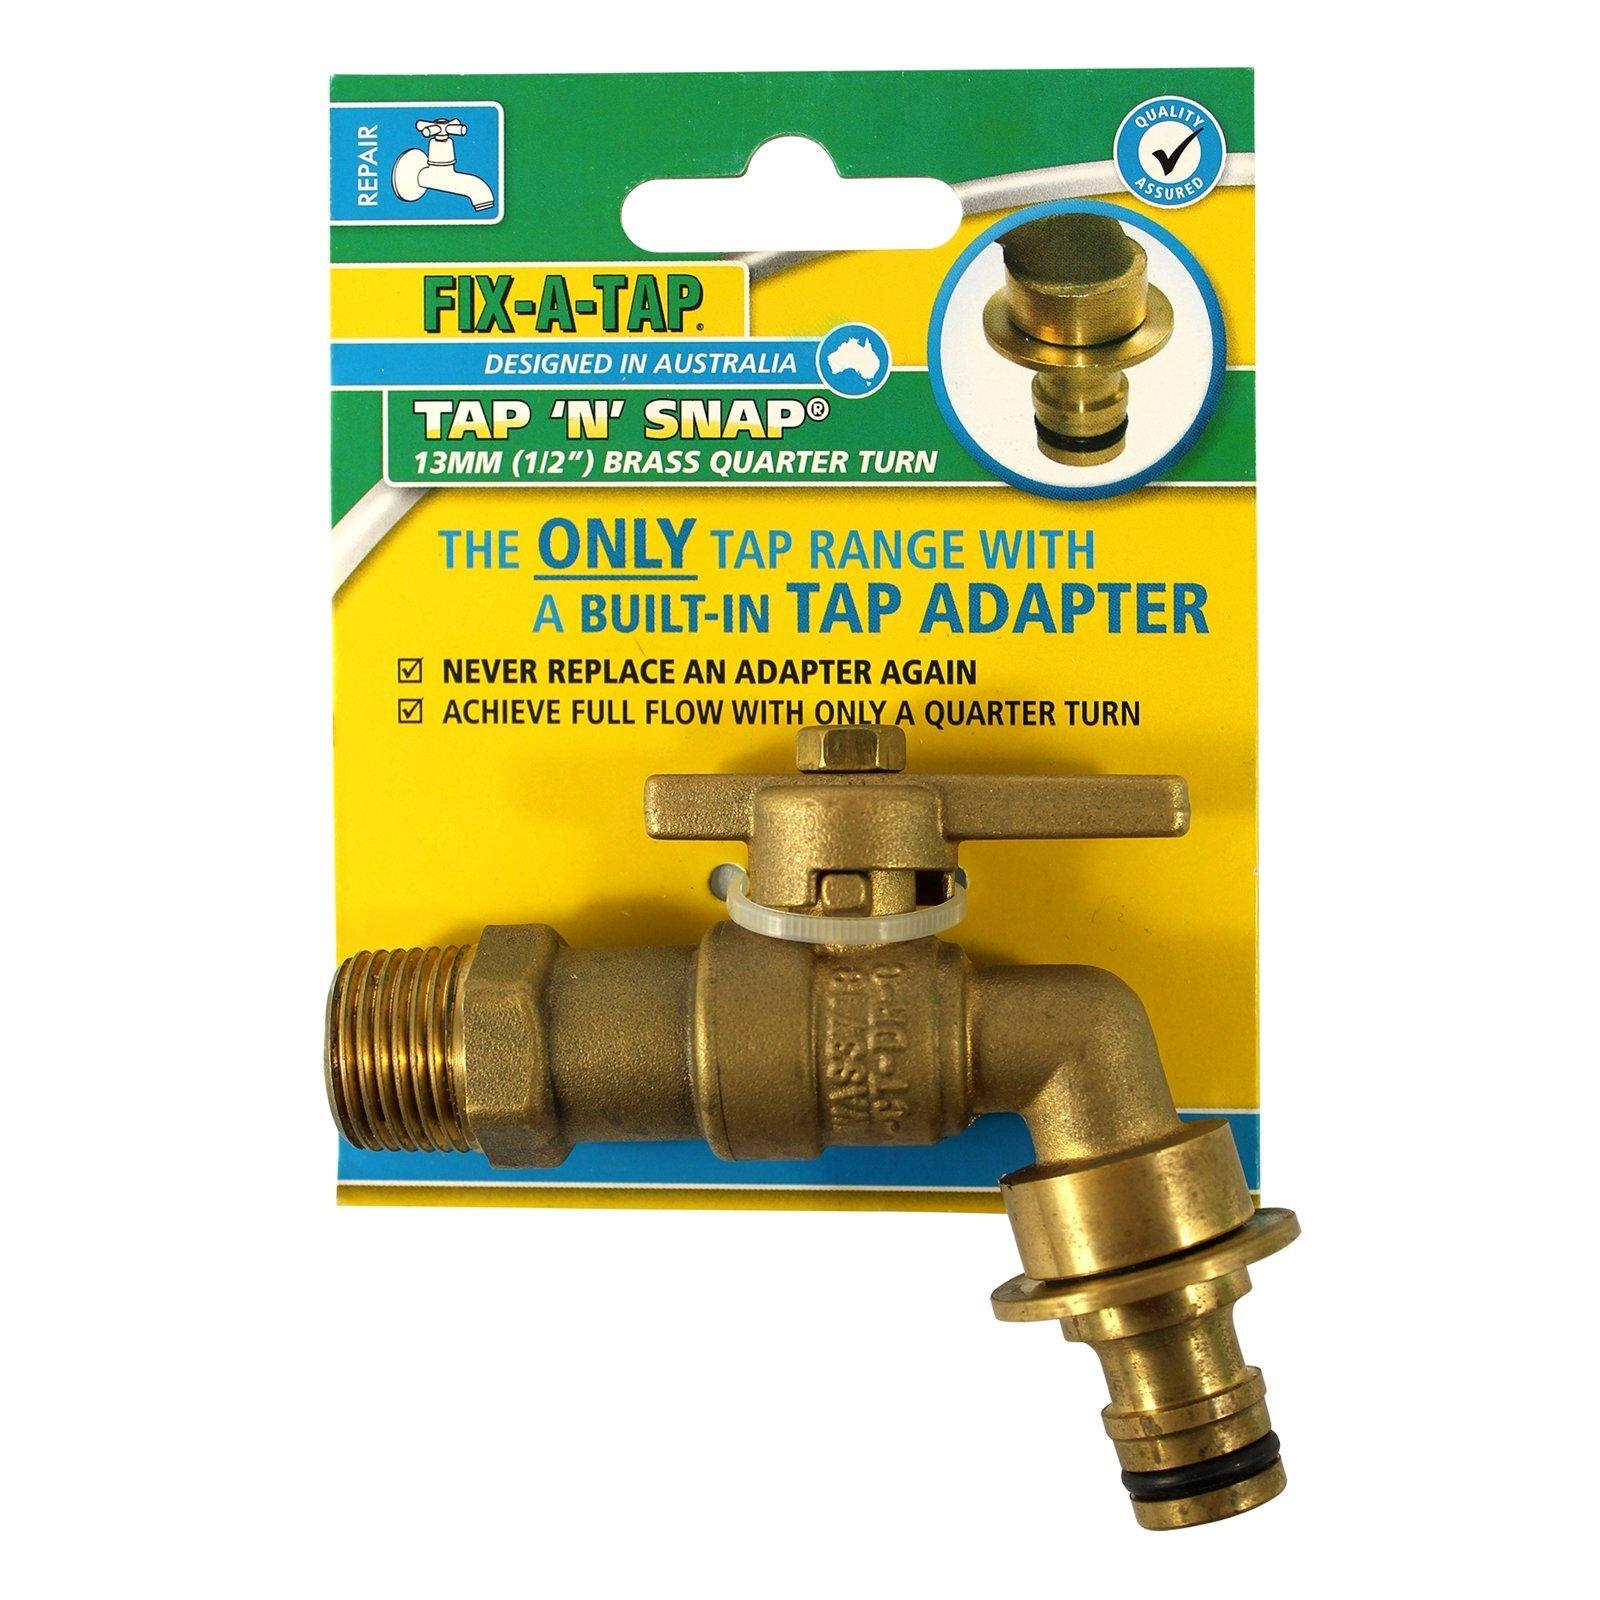 "FIX-A-TAP 13mm 1/2"" Tap N Snap Quarter Turn Garden Tap"